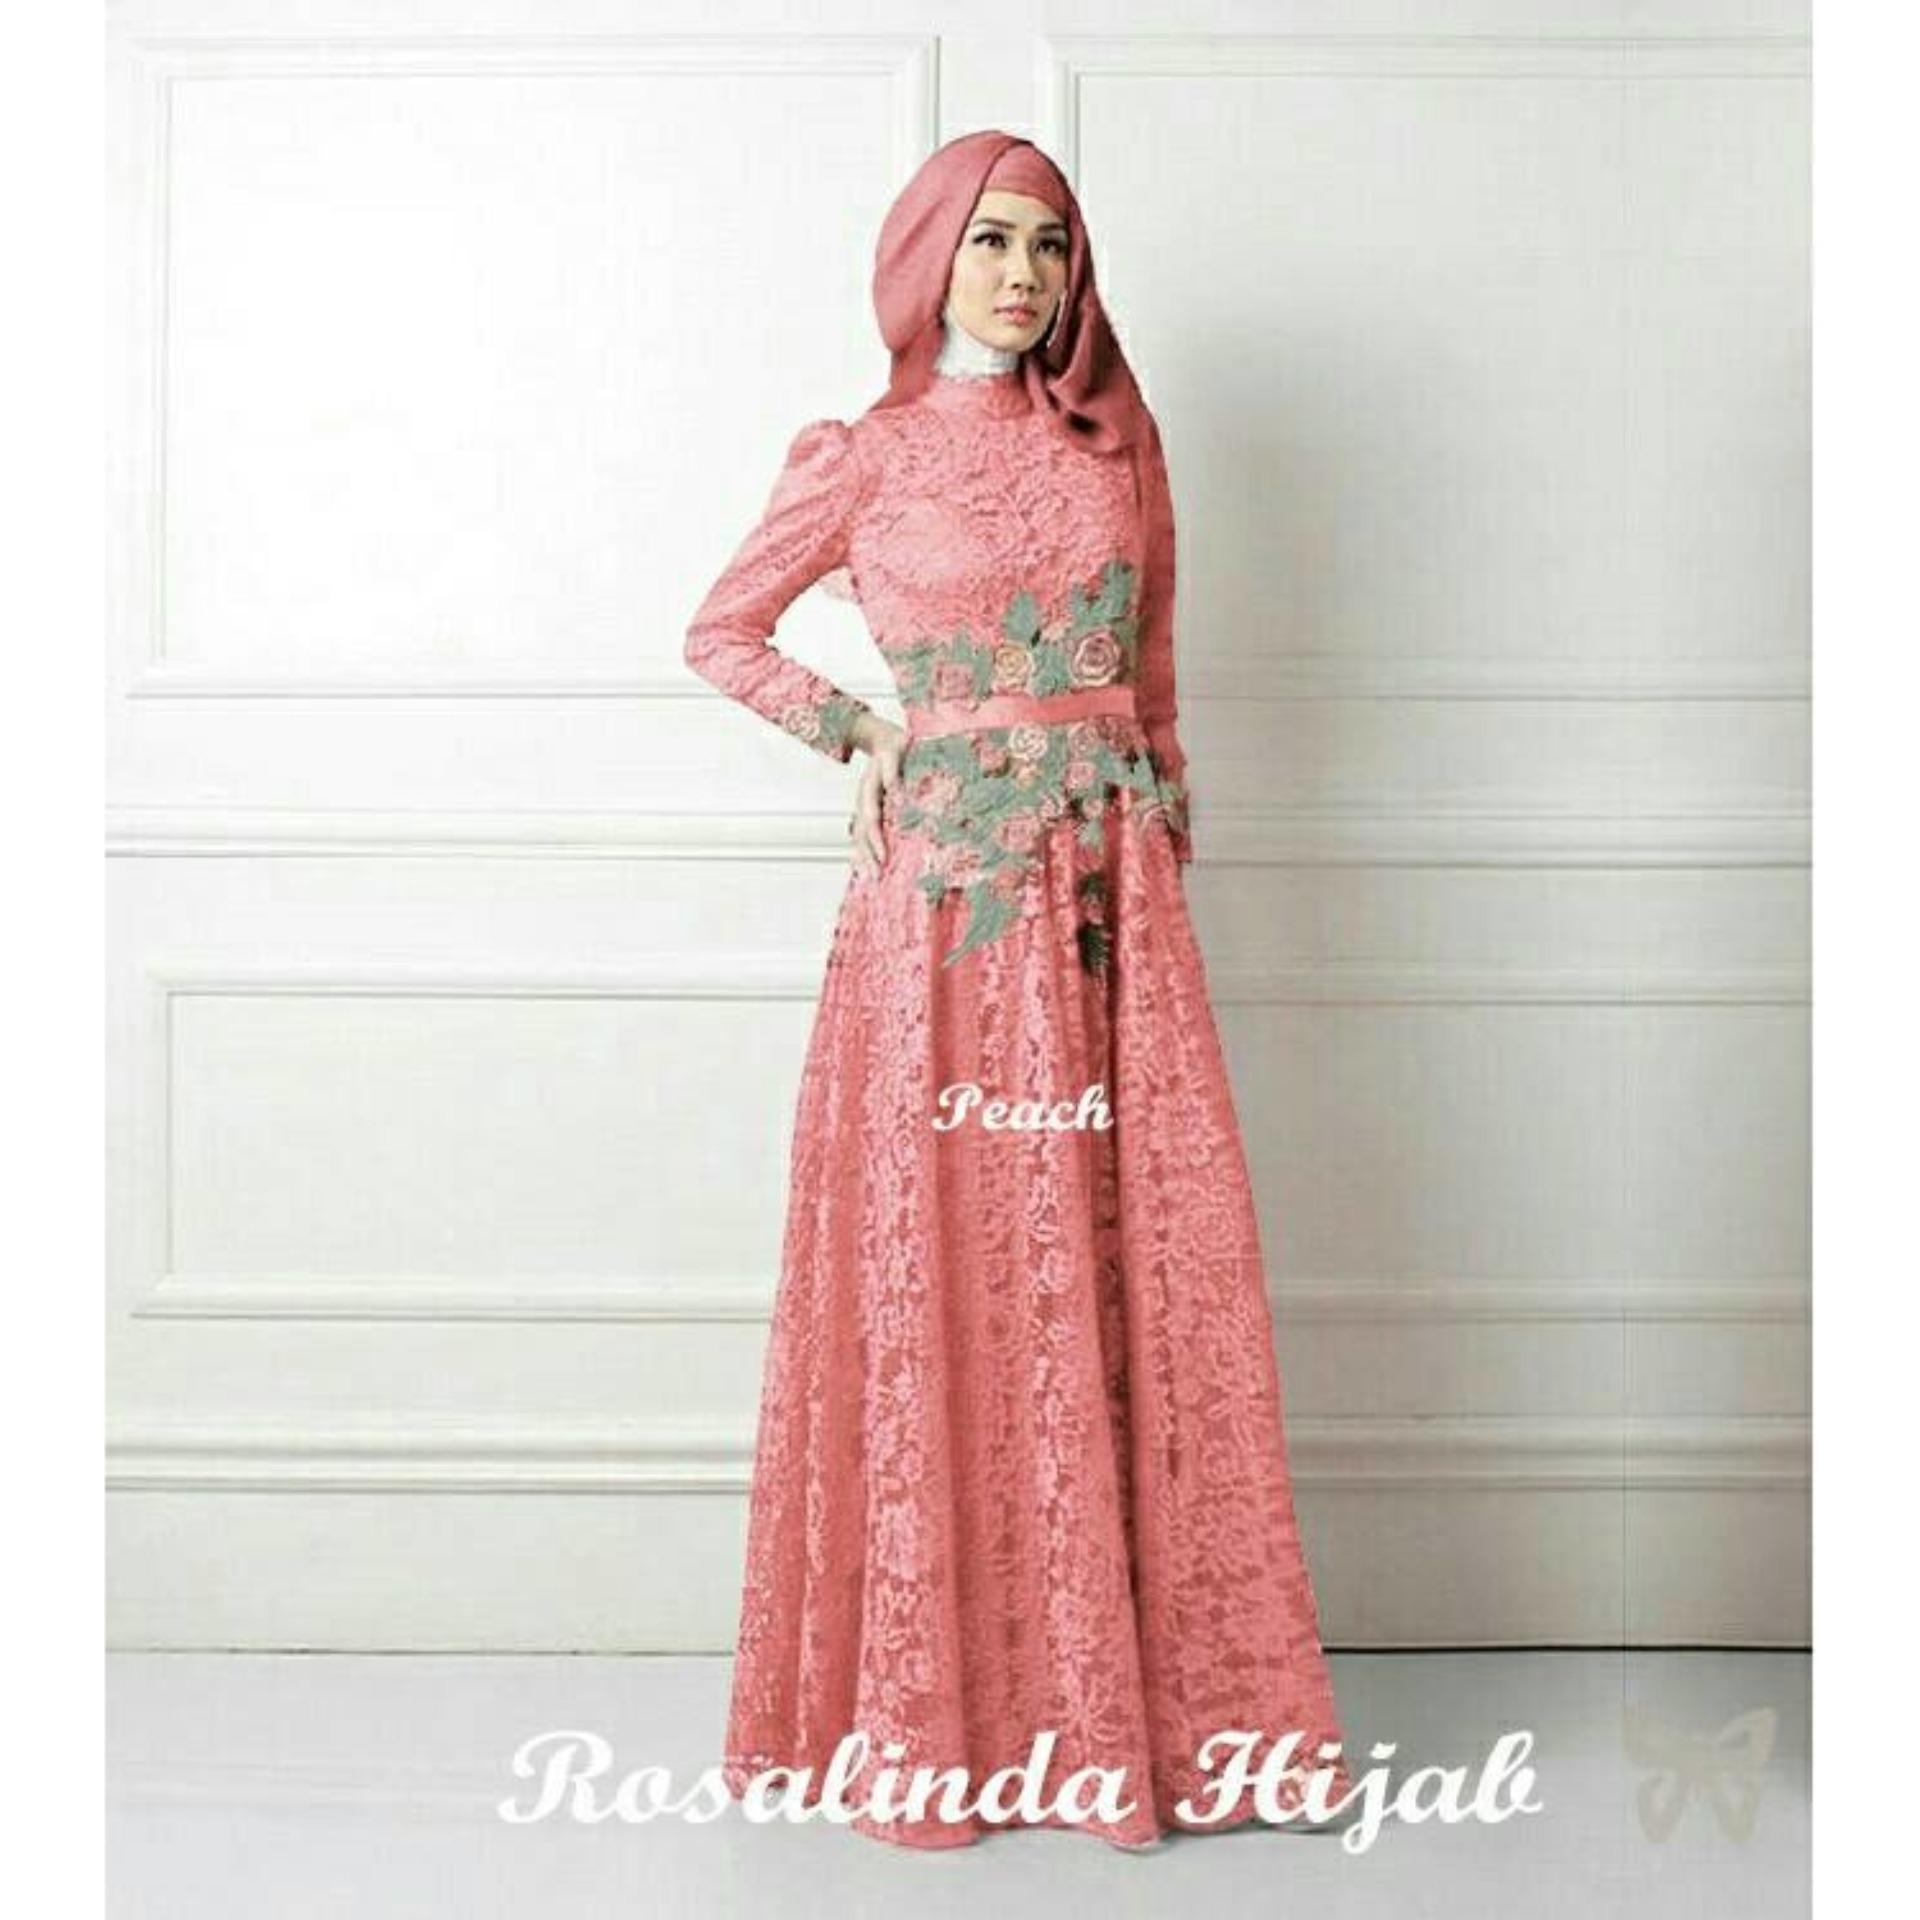 Happy Smart Shopping Rosalinda Peach Busana Muslim Pesta Wanita Terbaru  Gamis Terbaru dceaa5d435